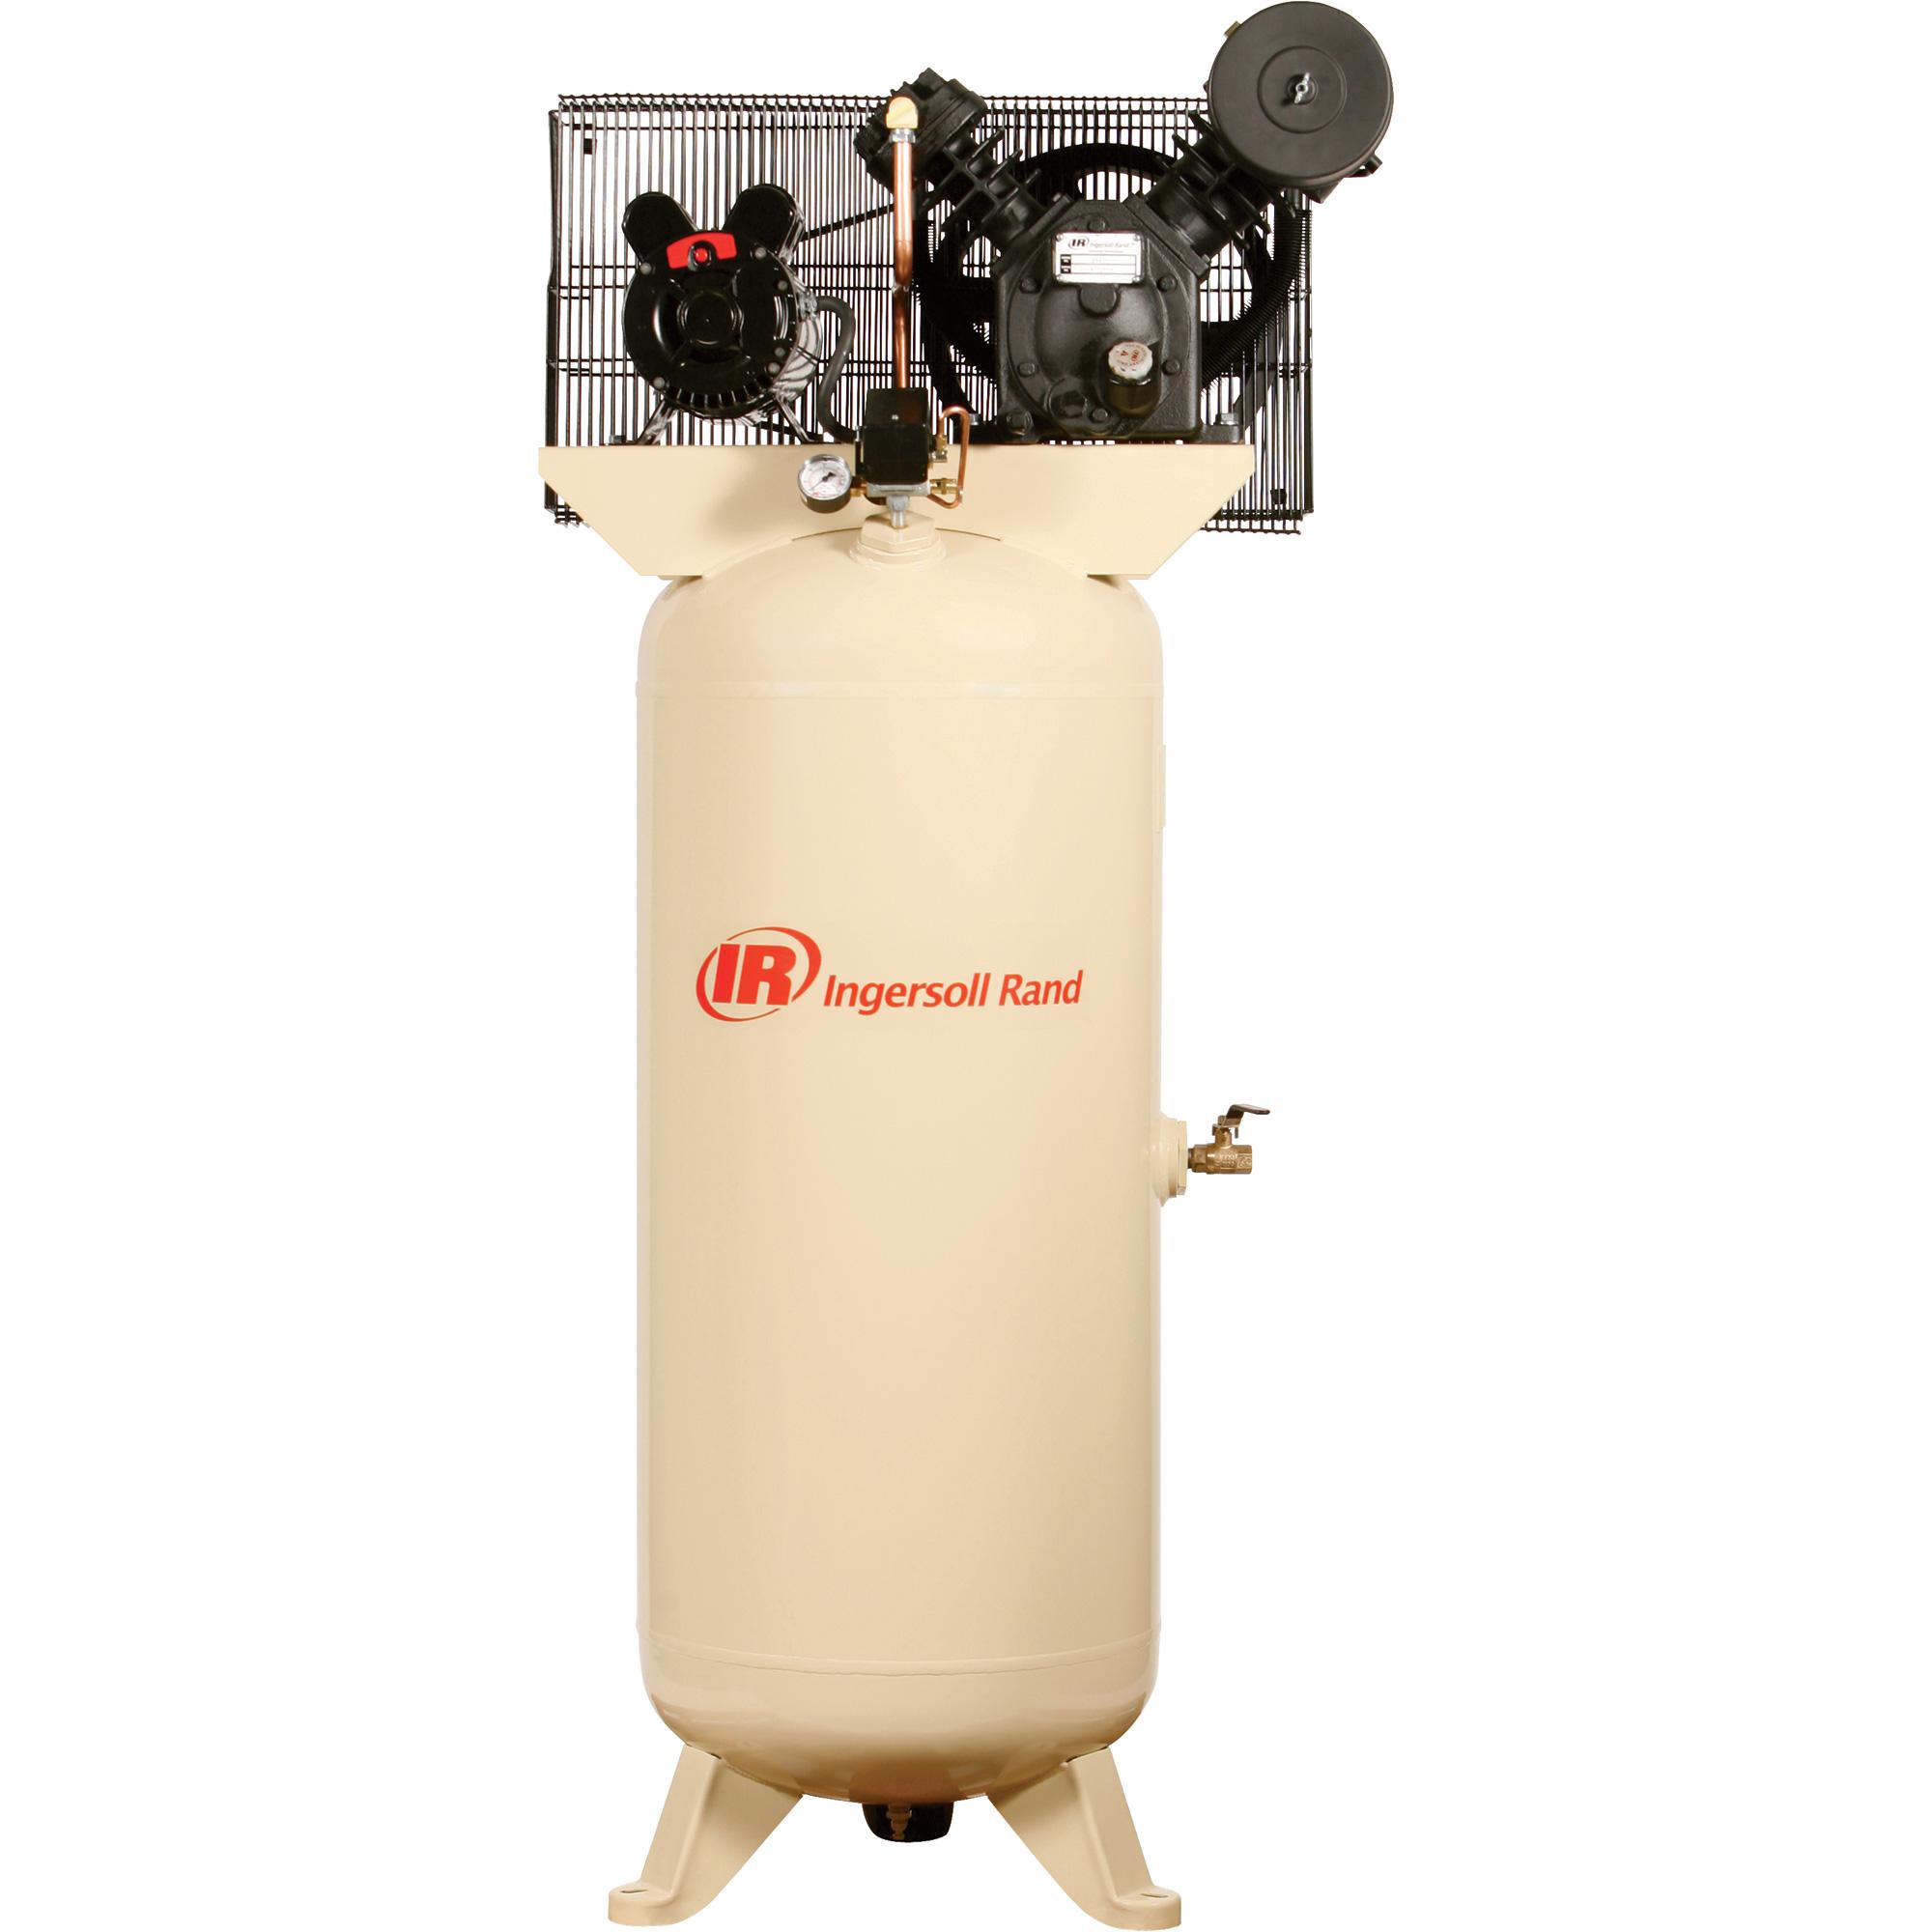 INGERSOLL RAND AIR COMPRESSOR 5HP 60GAL VERT 230V 1-PH 2-STAGE KIT-60 on